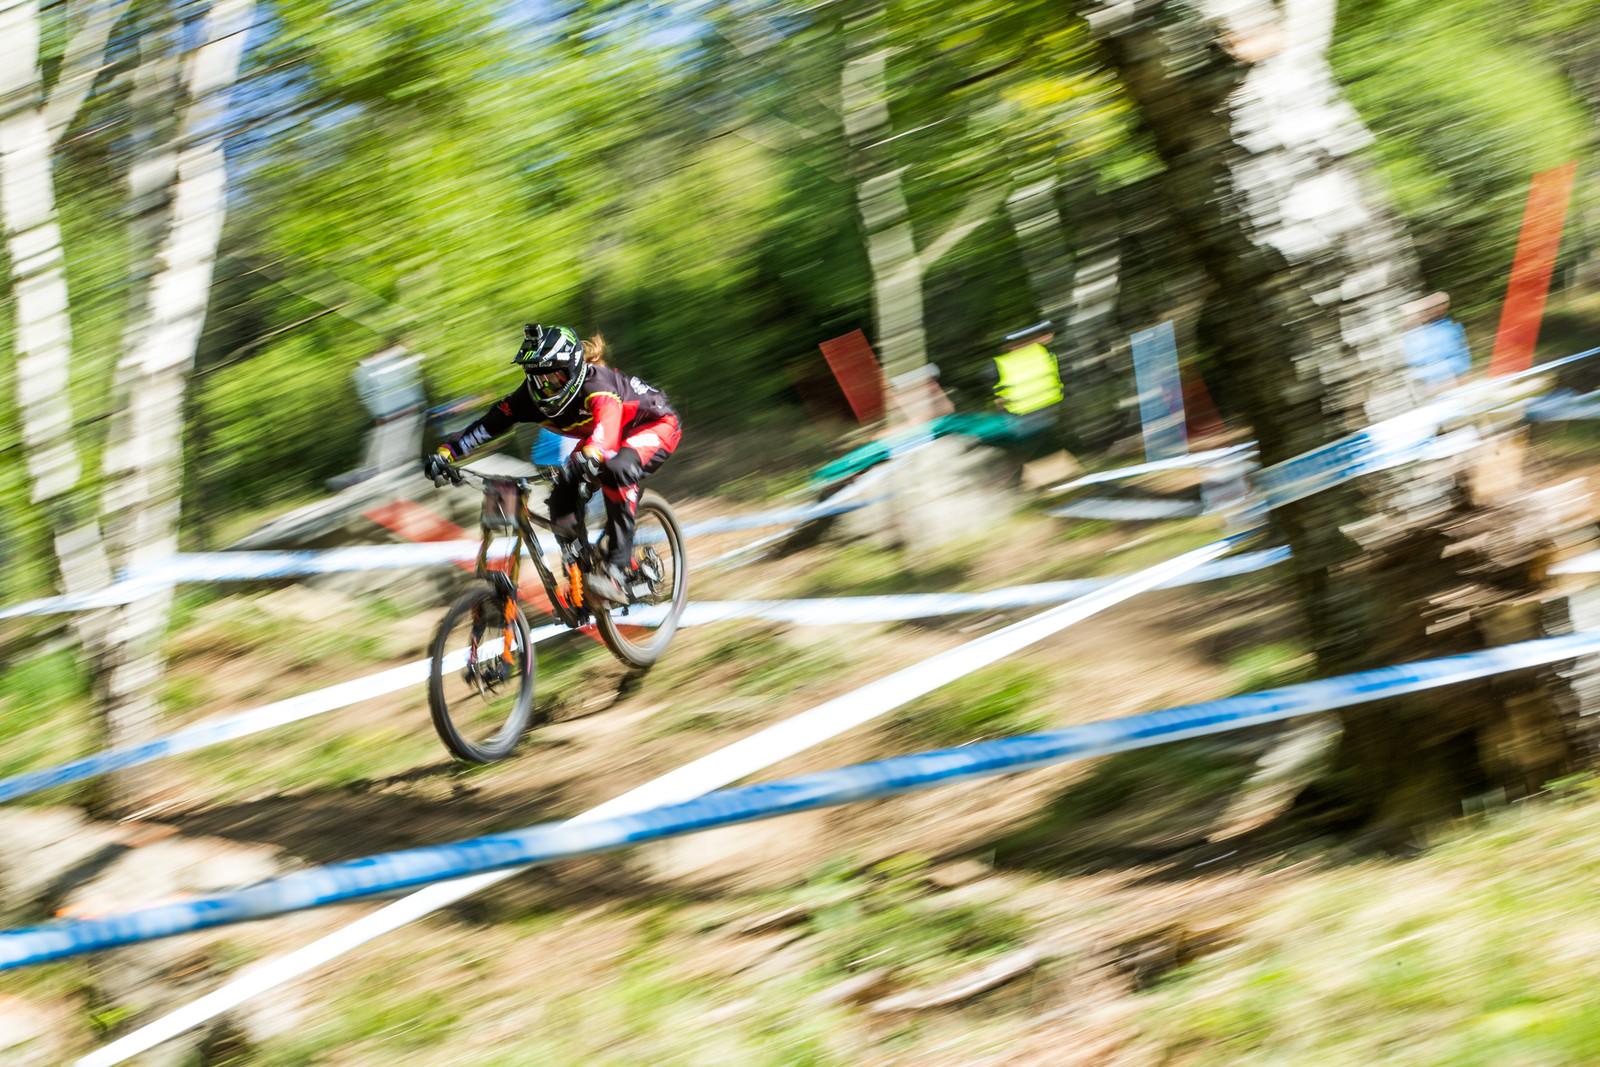 Manon Carpenter - Lourdes World Cup Timed Training Action Photos - Mountain Biking Pictures - Vital MTB